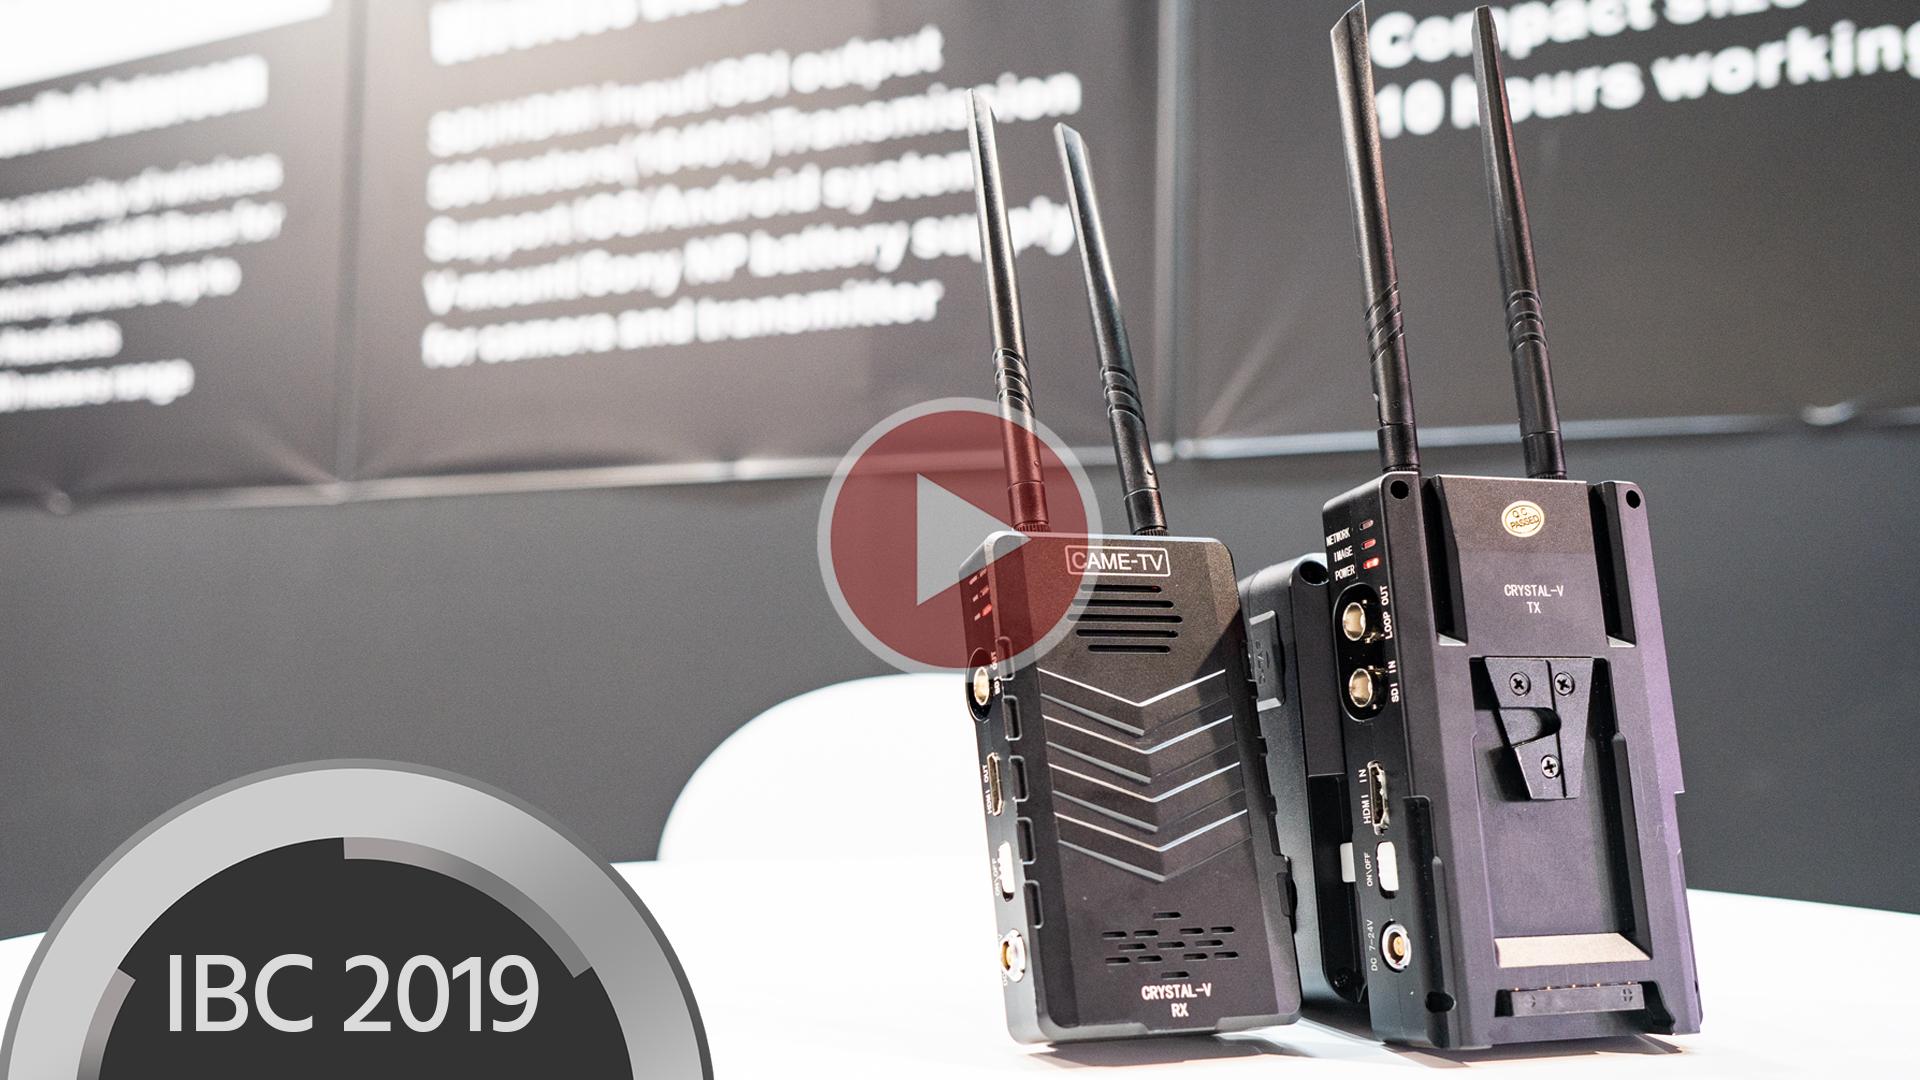 CAME-TV Crystal V – Transmisor de video inalámbrico SDI y HDMI hasta 500 m de distancia